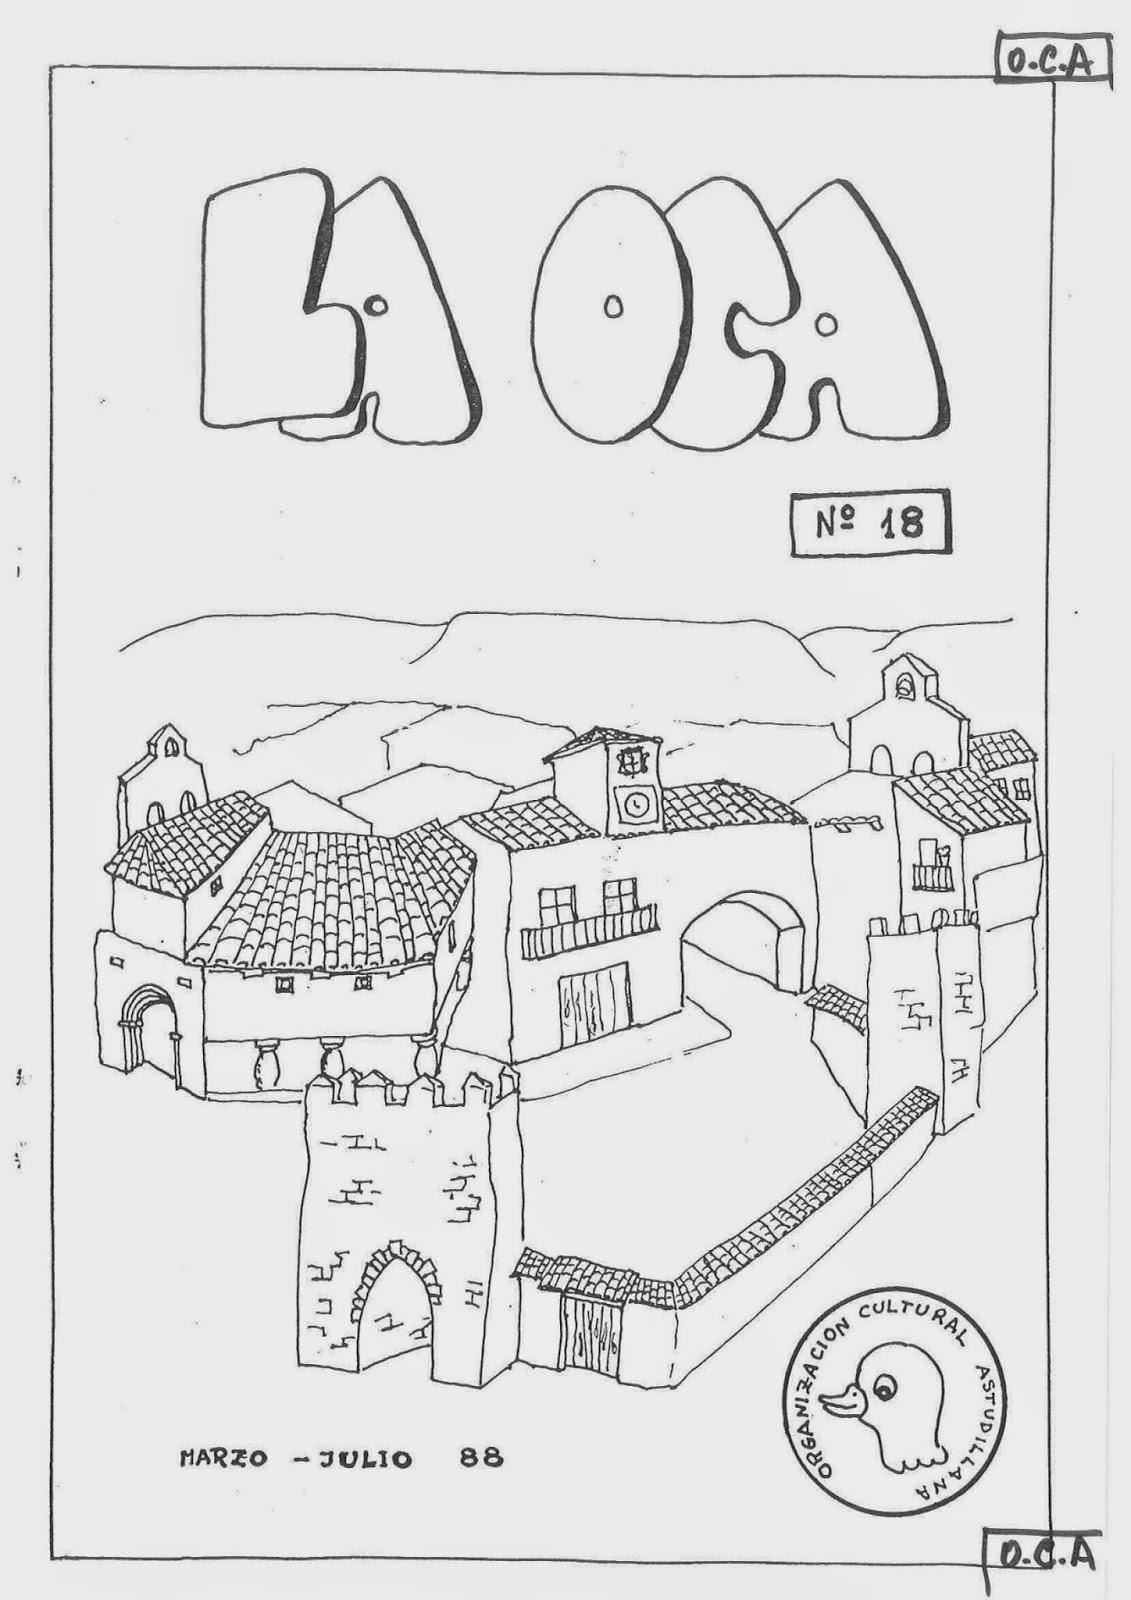 http://es.scribd.com/doc/223270696/La-Oca-n-18-Verano-88